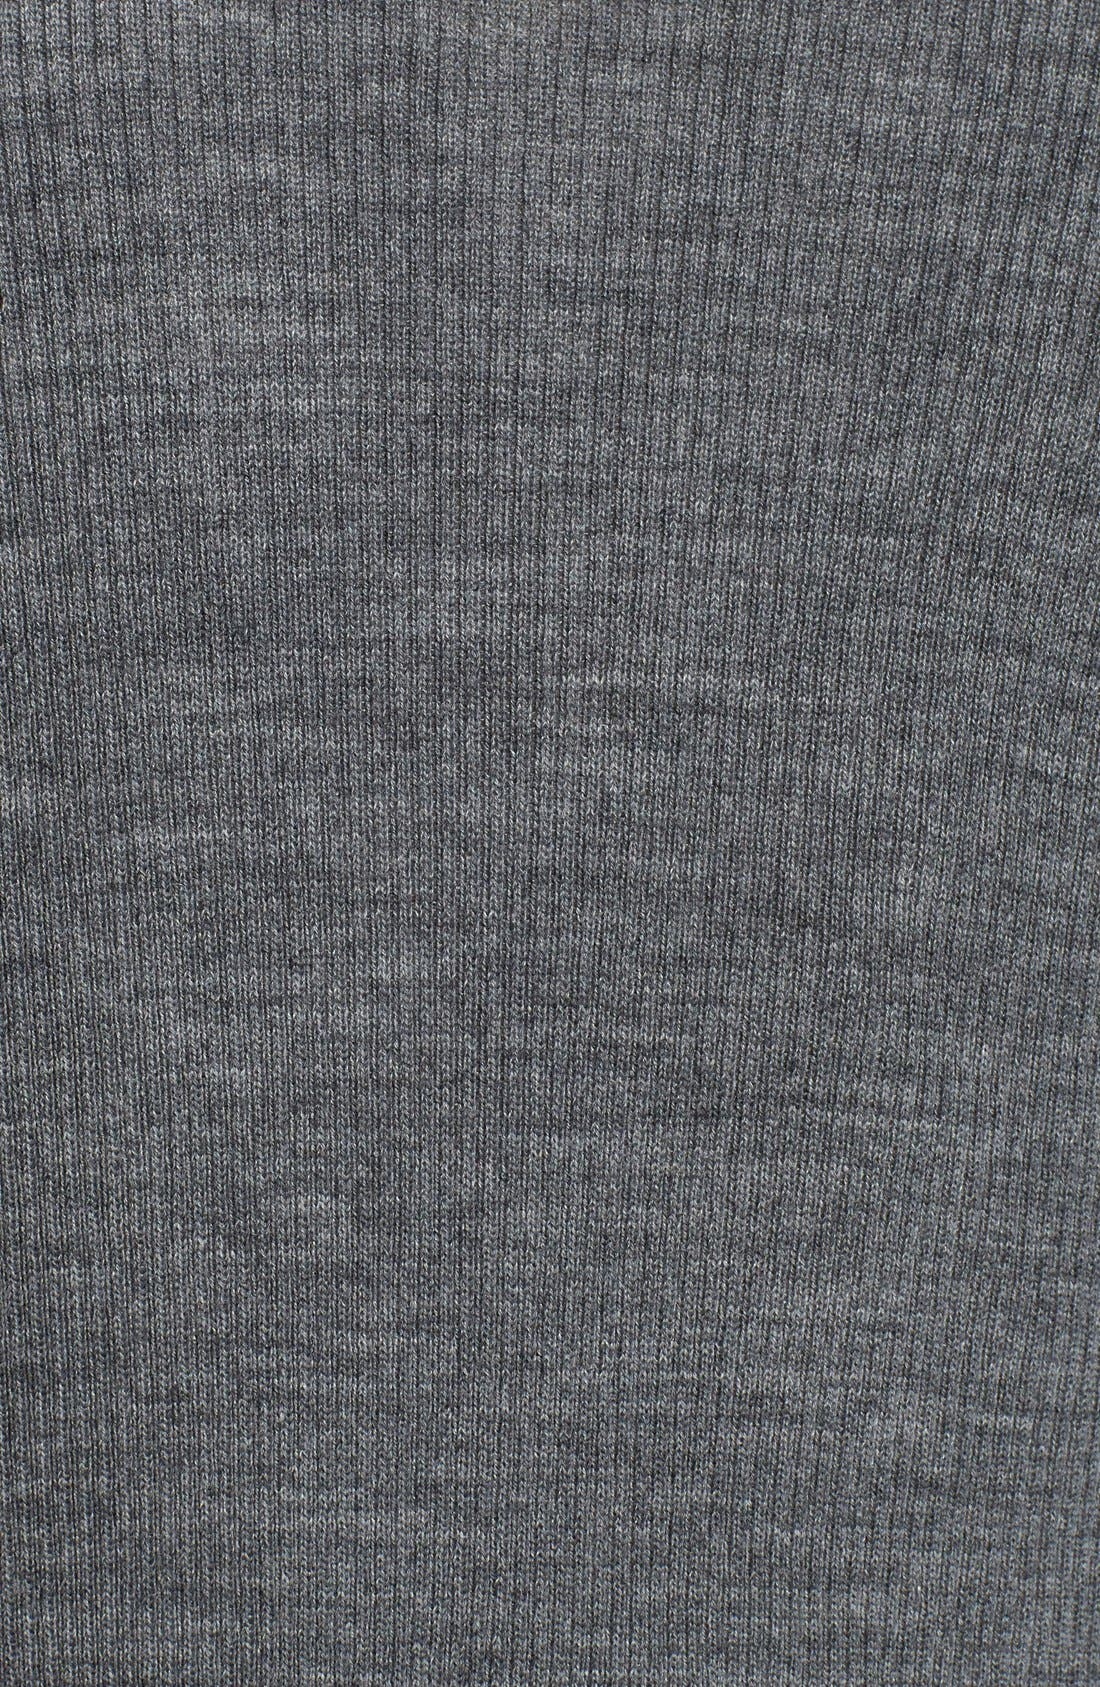 Rib Knit Wool Blend Cardigan,                             Alternate thumbnail 6, color,                             Heather Dark Grey